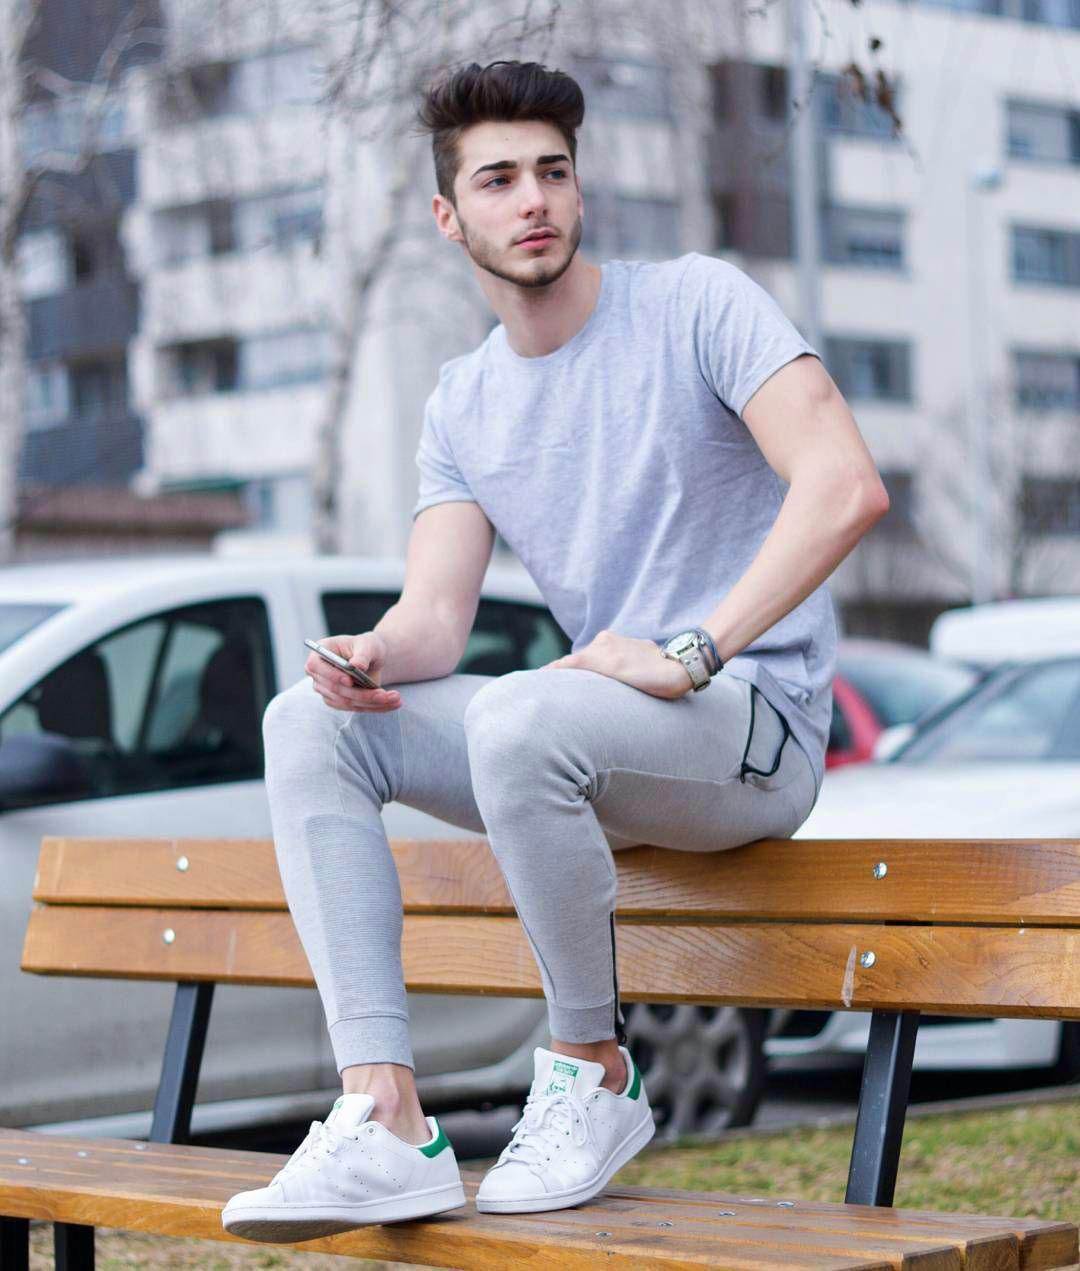 2021 Smart Stylish Boy Images download